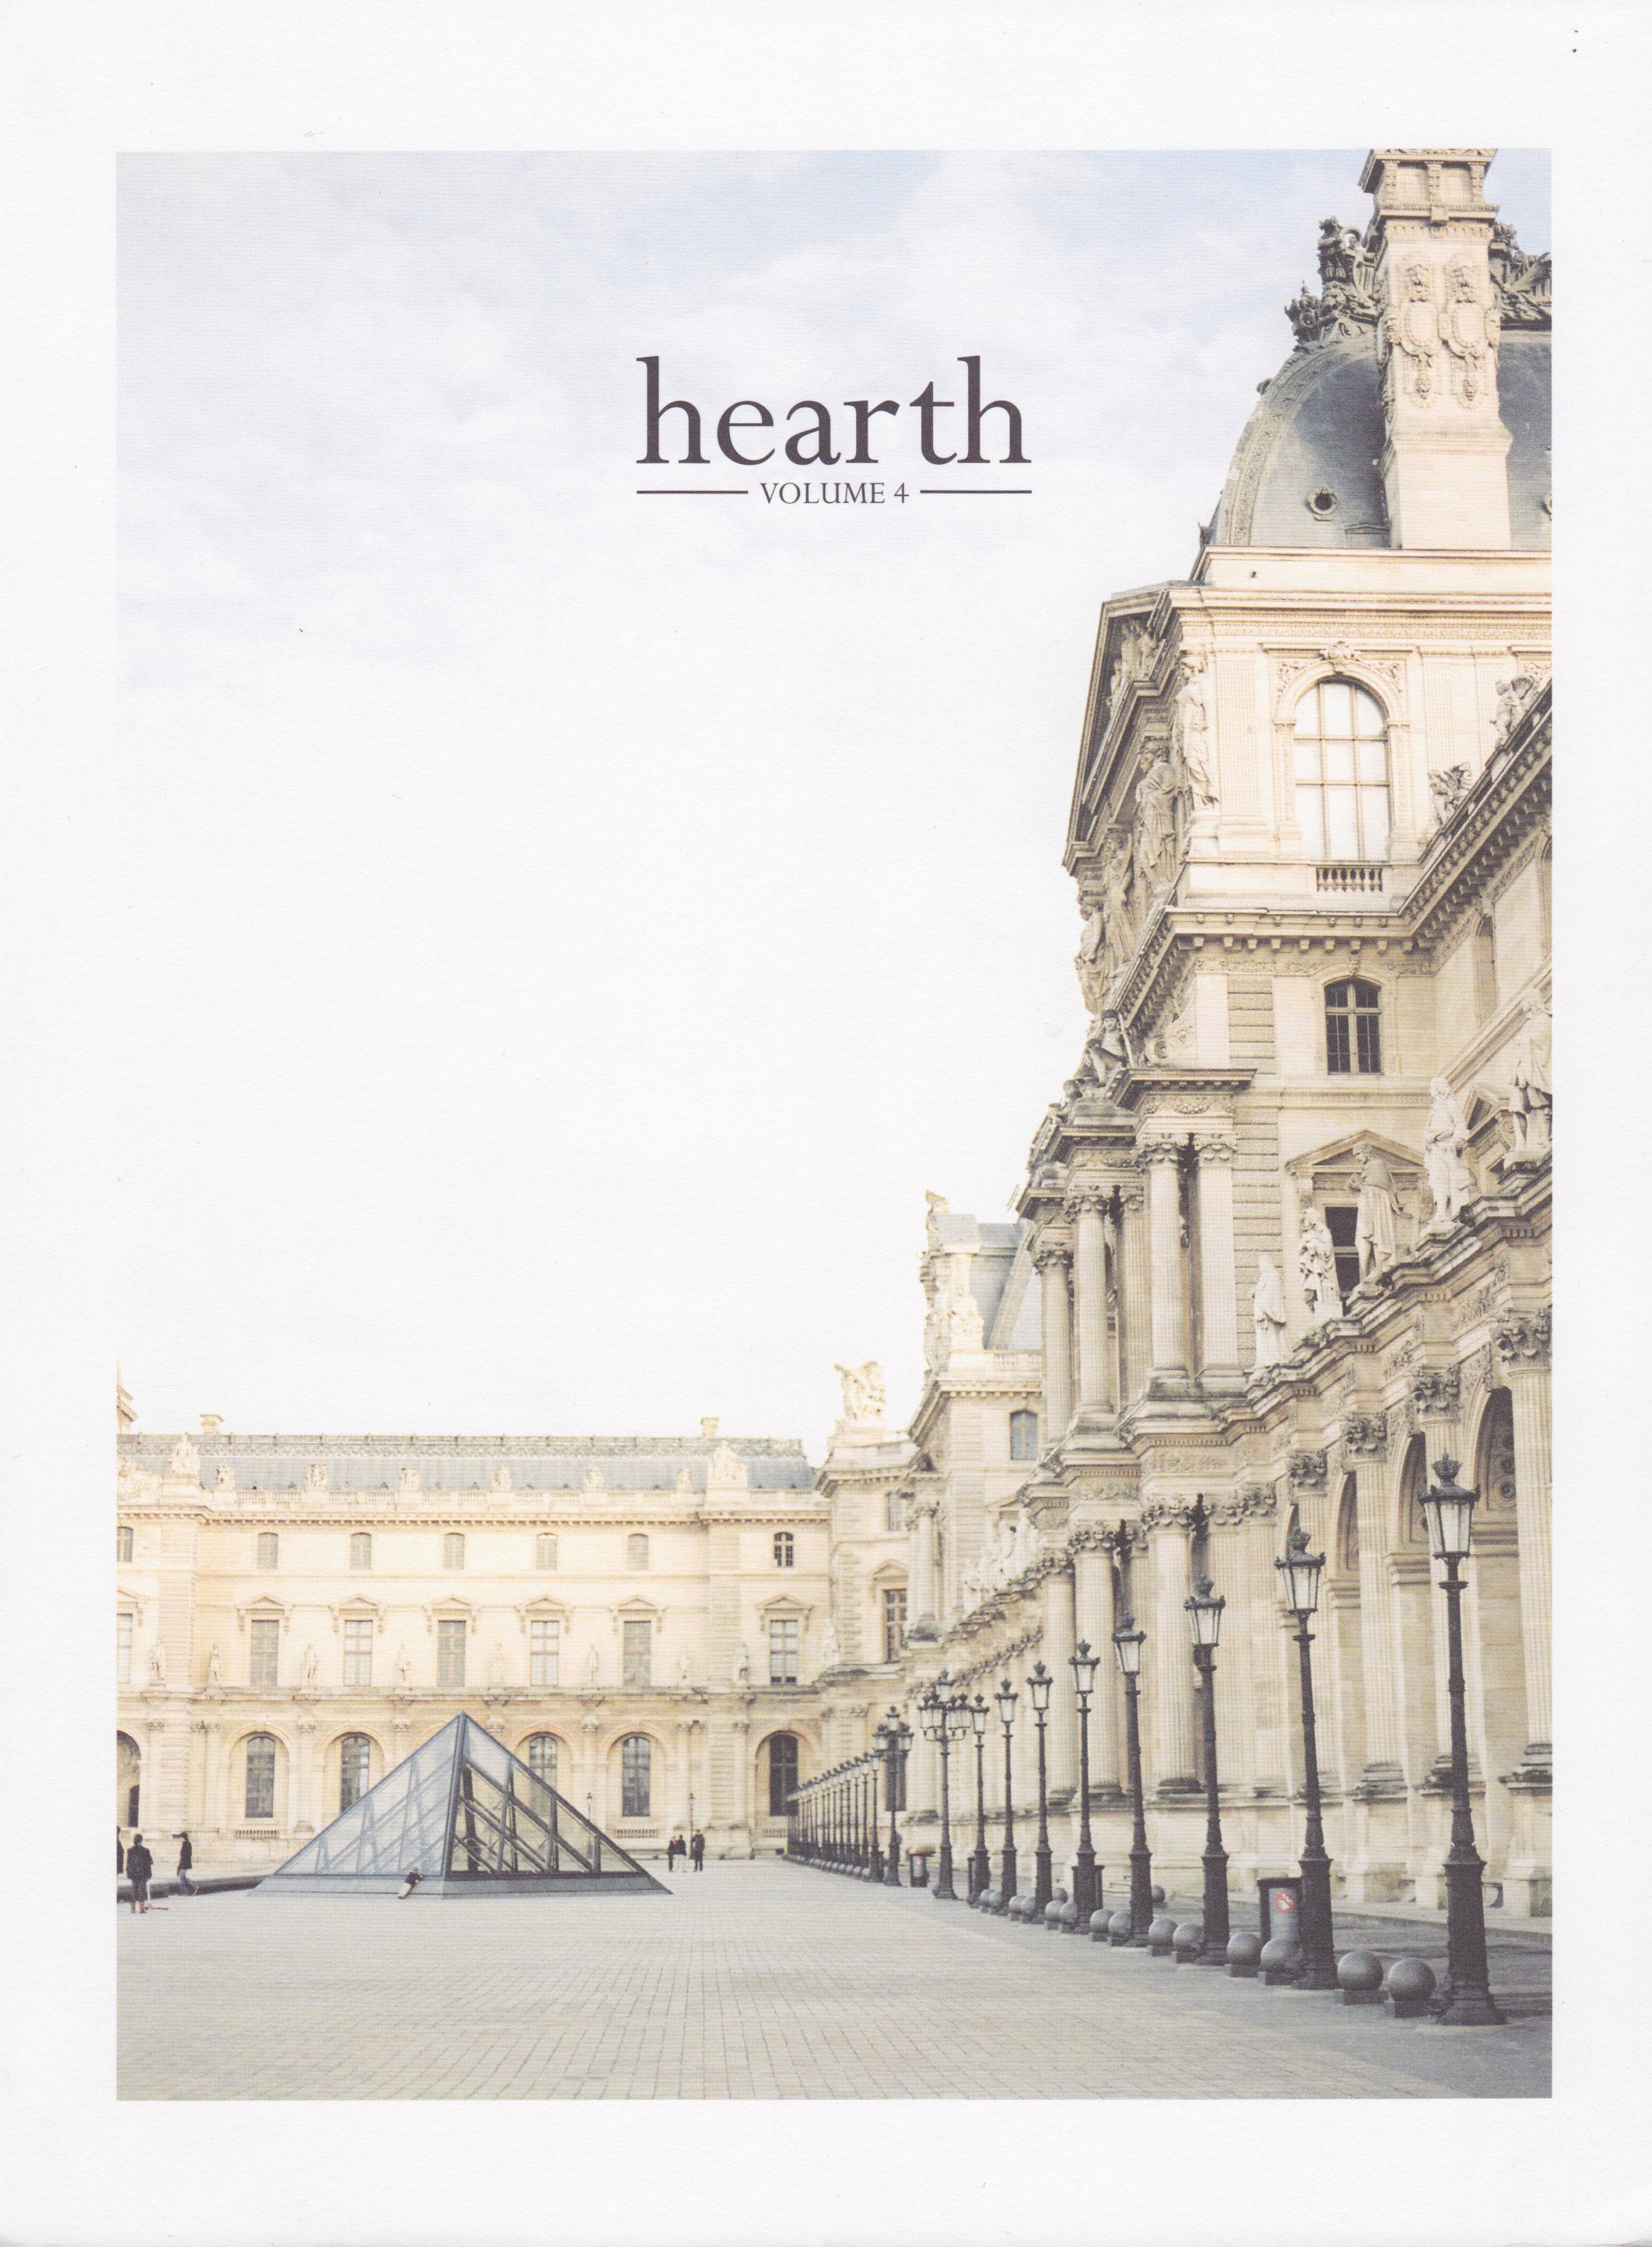 kendra-aronson-hearth-magazine-isobell-designs-7.jpg